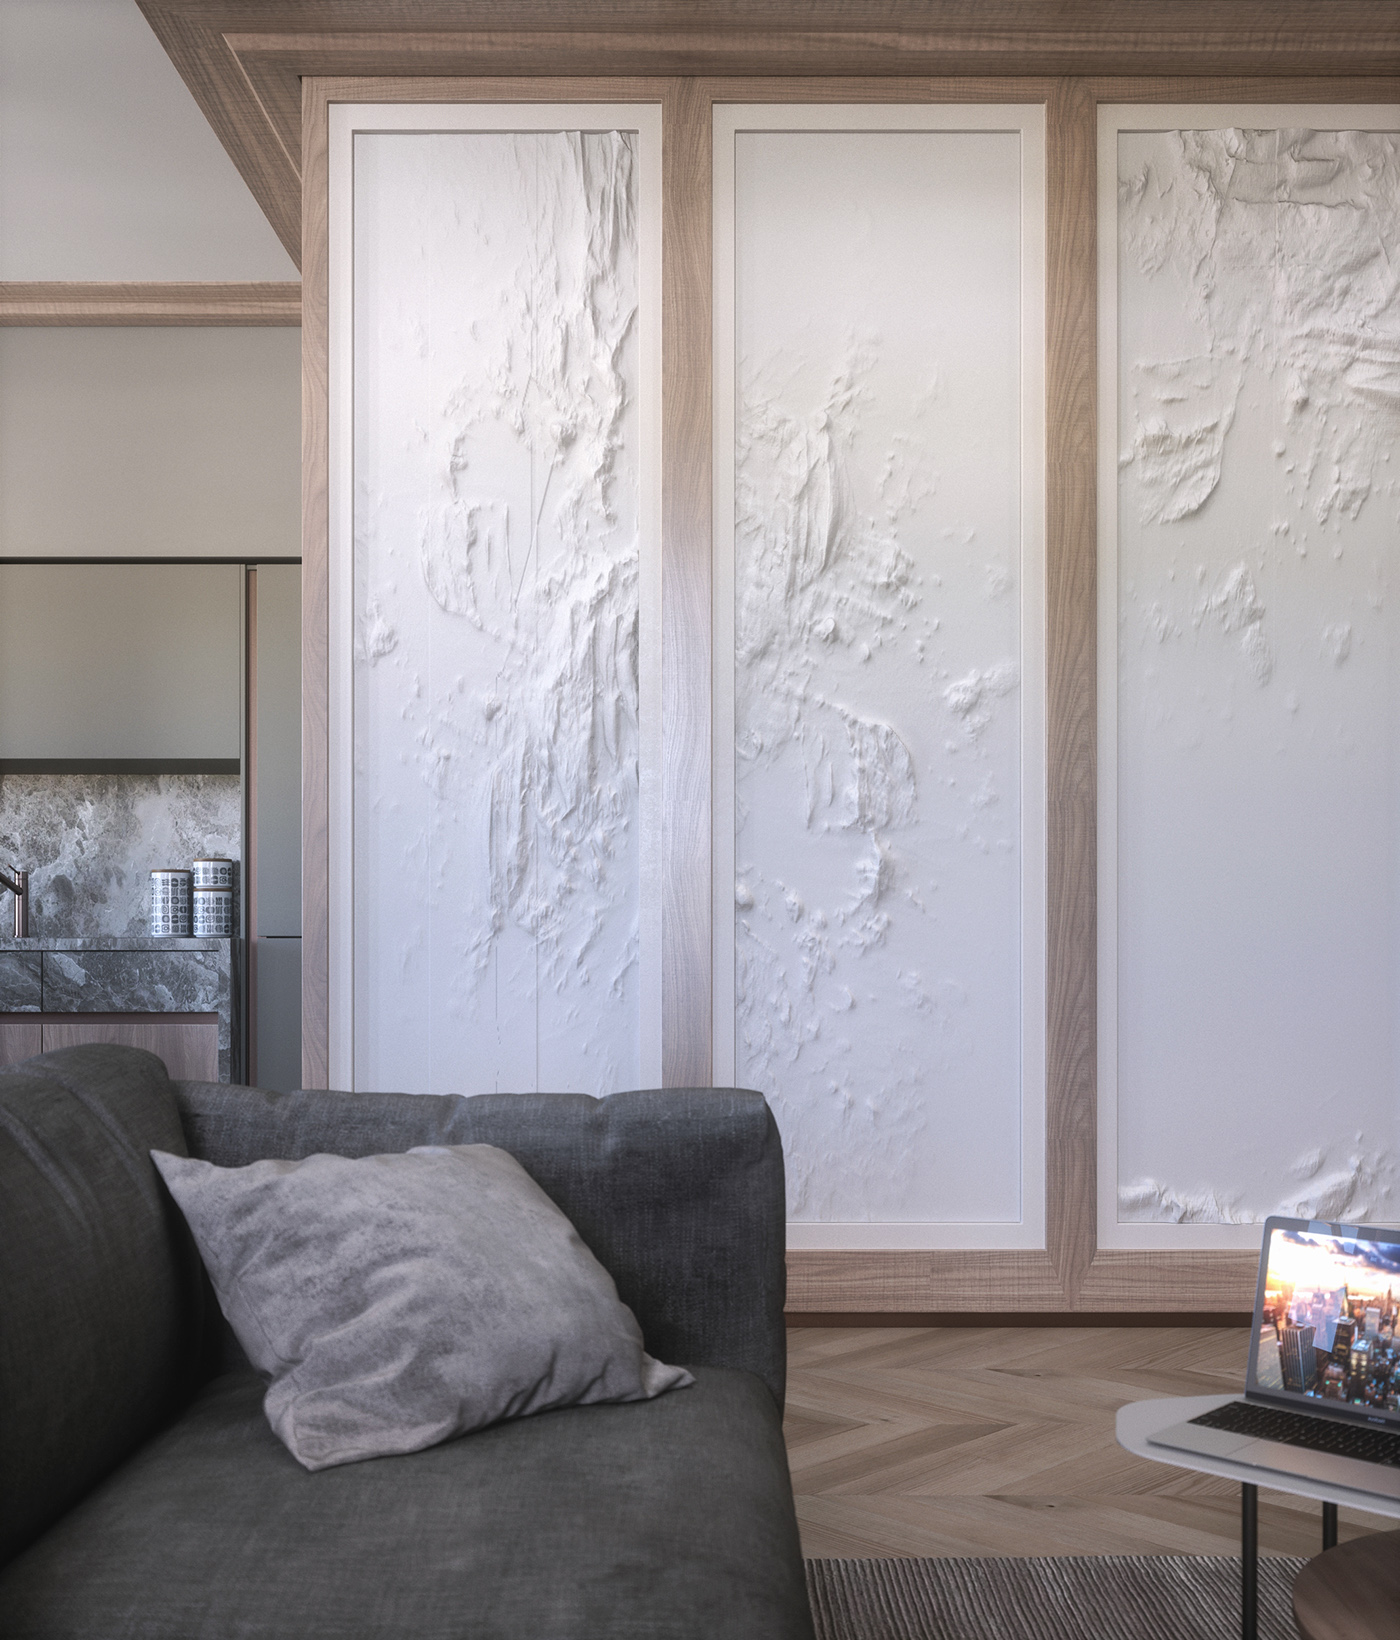 FStorm conceptvision blue red modern classic Natuzzi poliform plaster wood stone